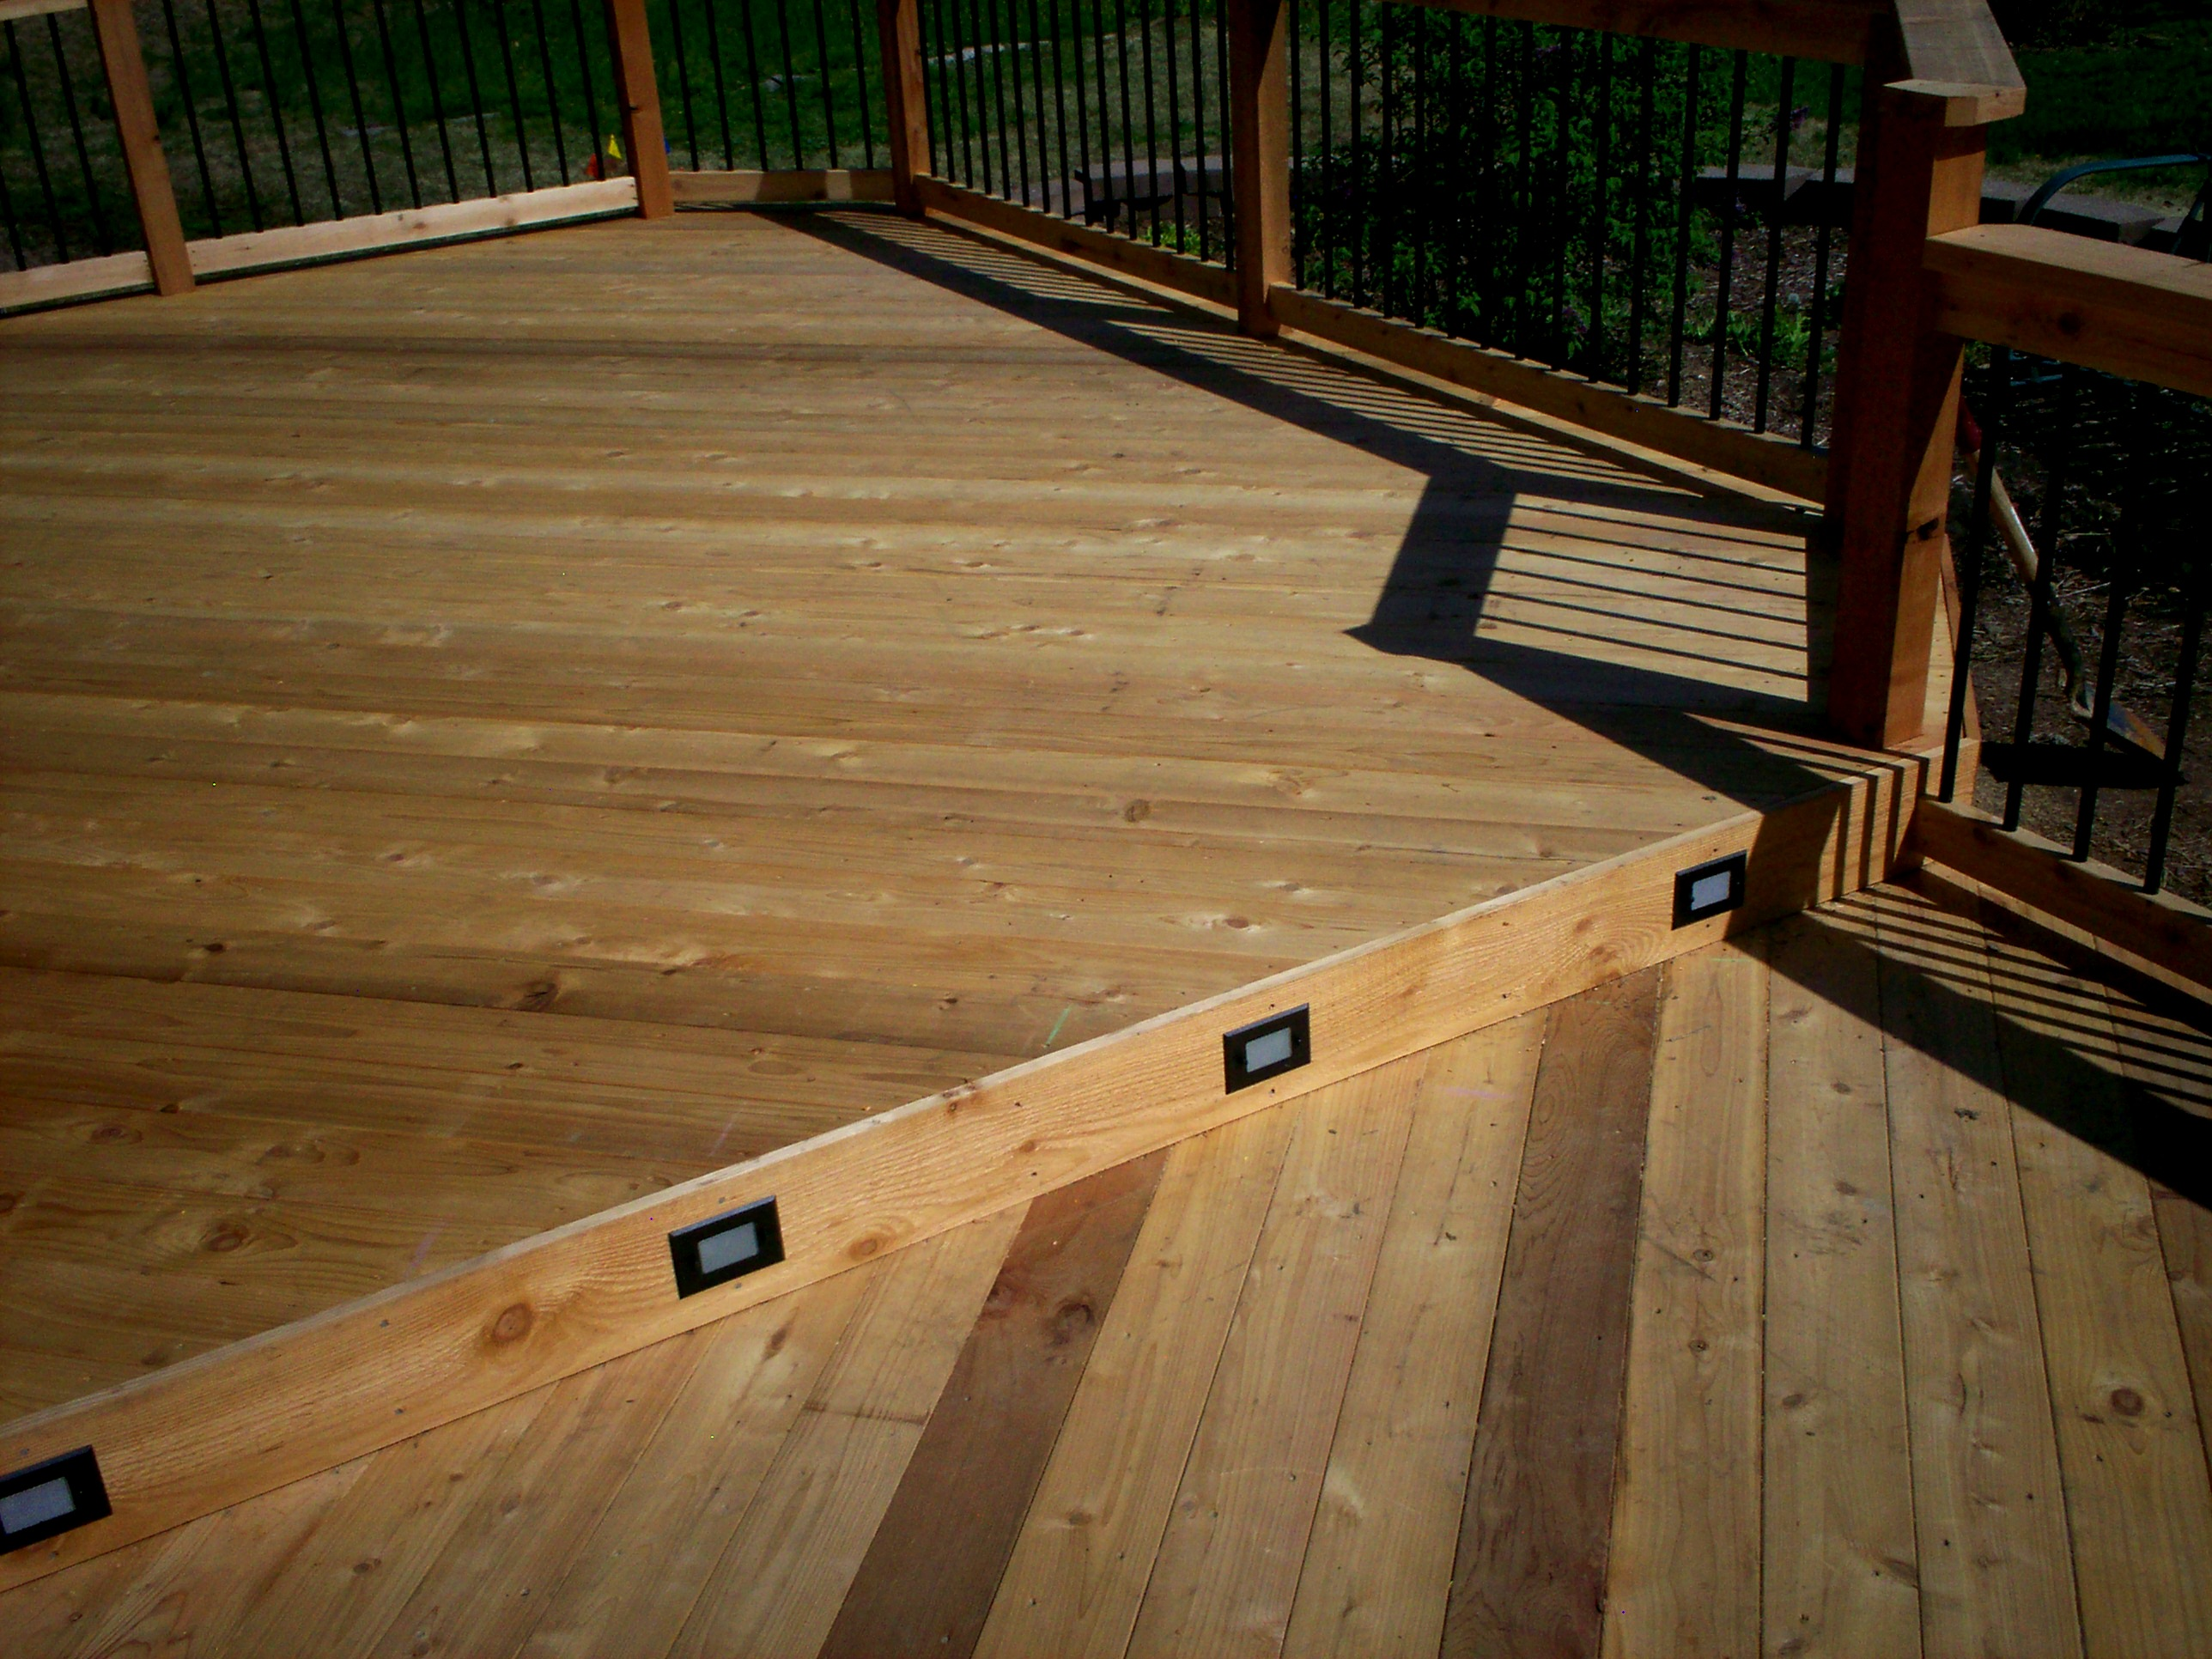 Wood Amp Hardwood Decks St Louis Decks Screened Porches